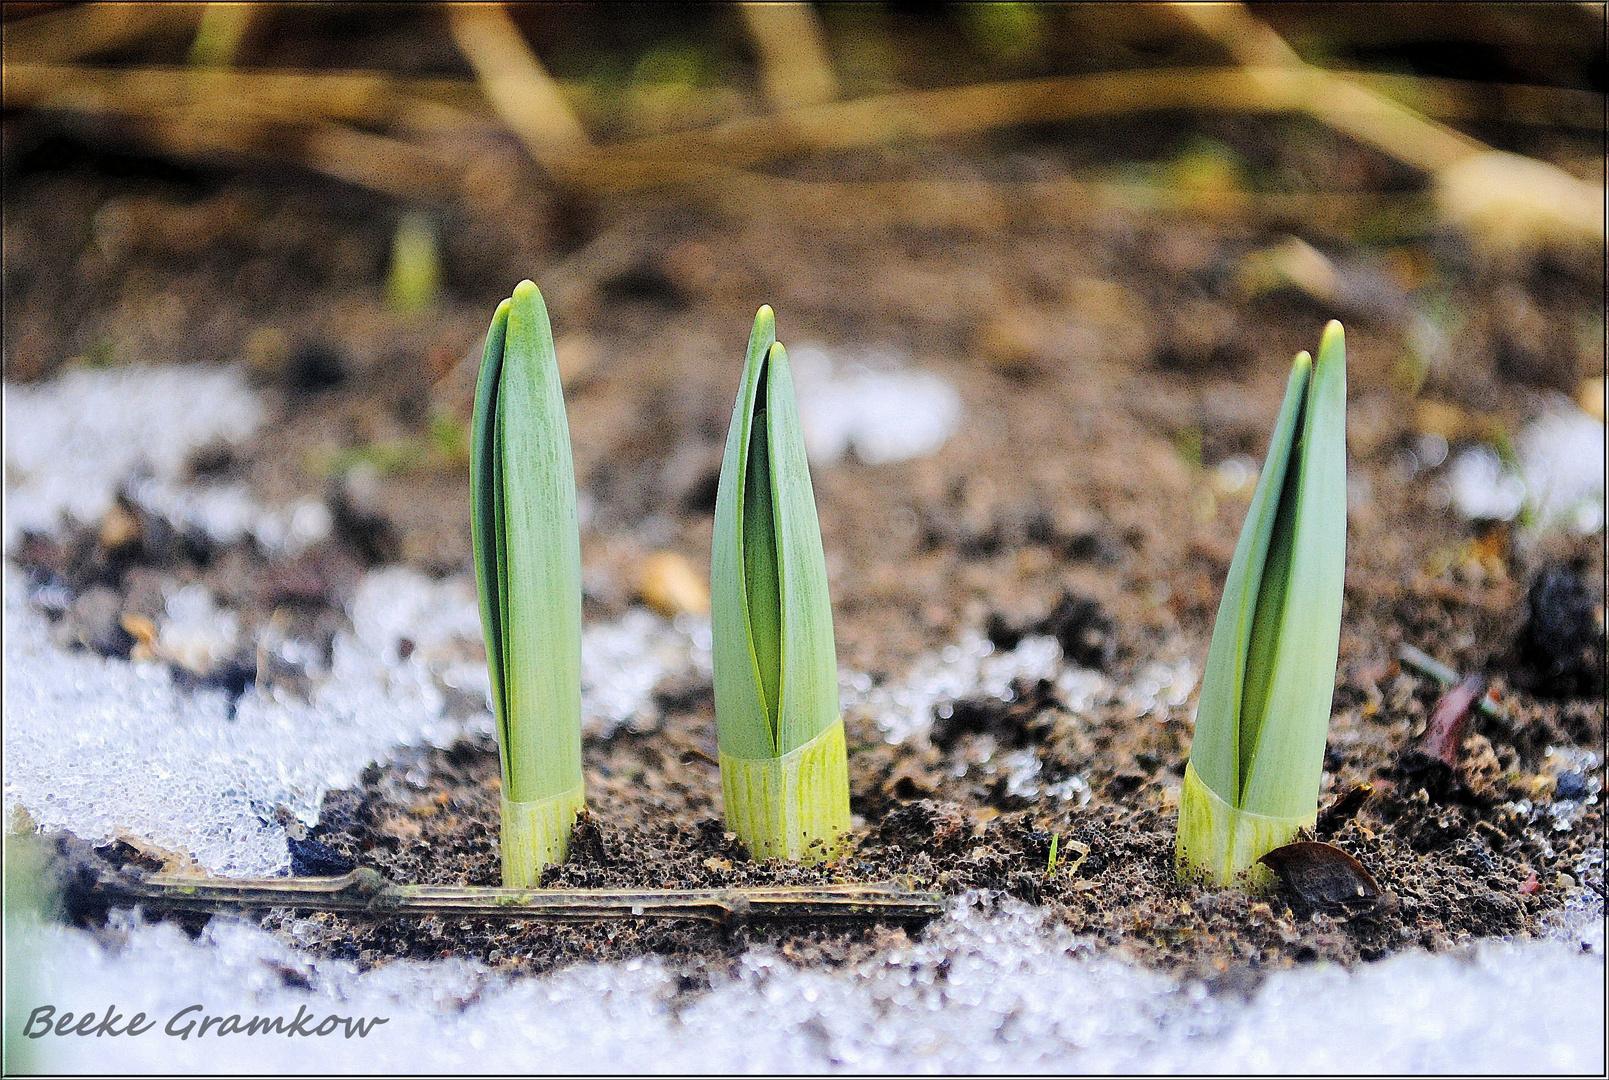 Der Frühling ruft